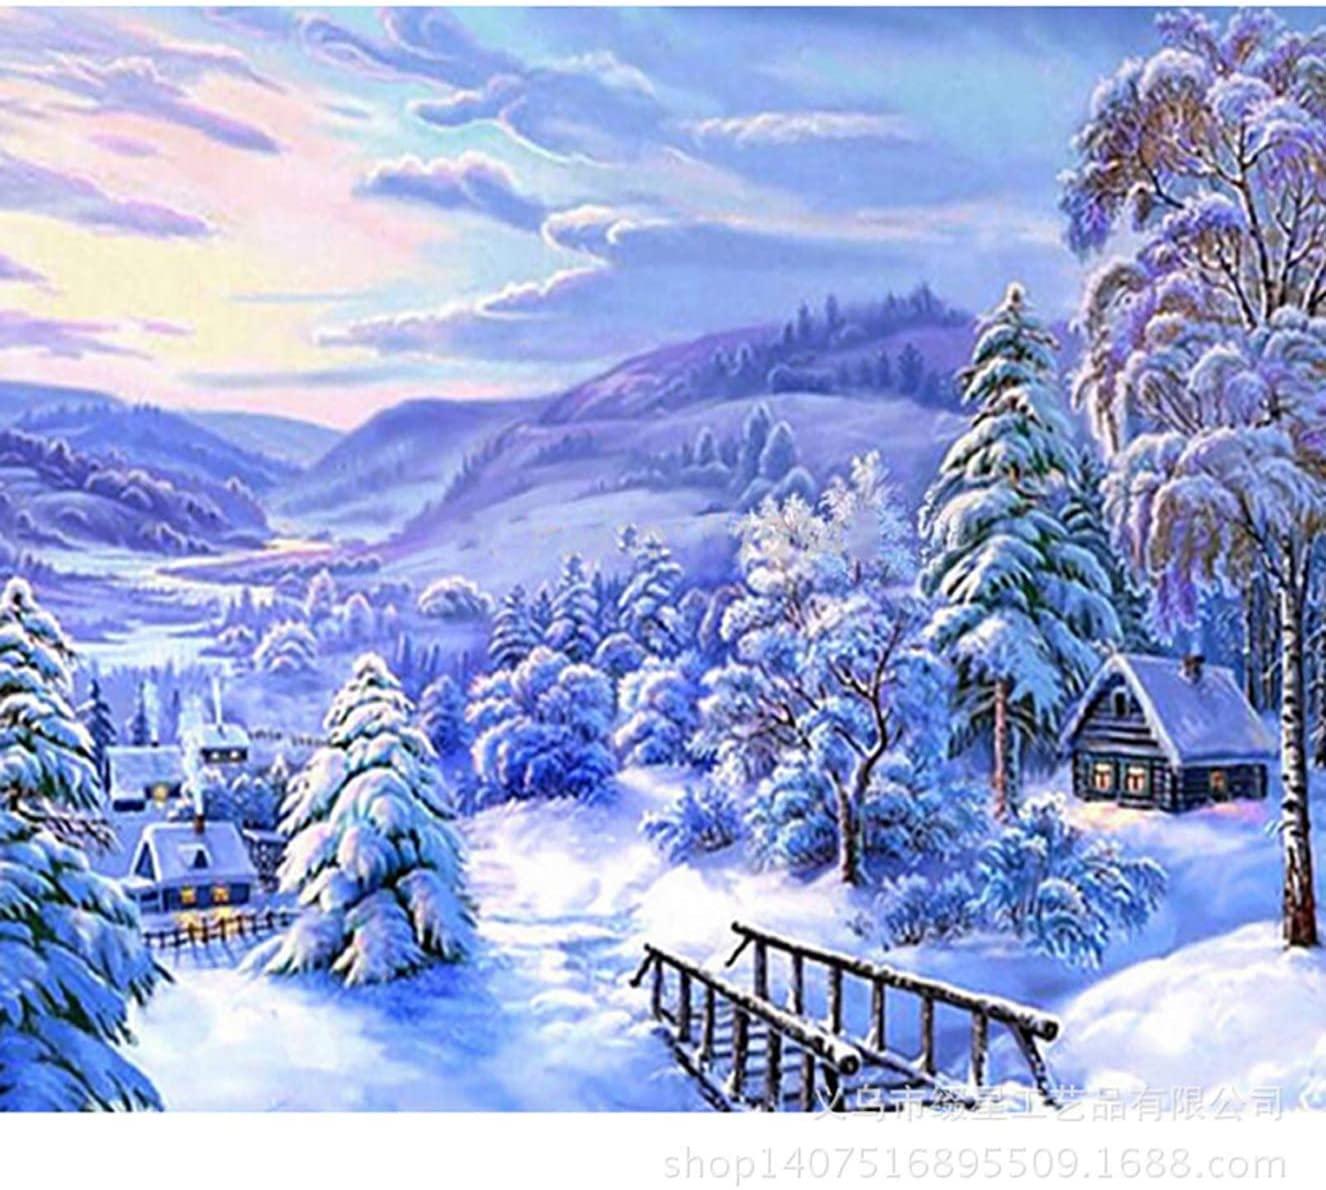 Bimkole DIY 5D Diamond Painting Kit Winter Landscape by Number Kits Paint with Diamonds Arts DIY for Home Decor, 16x20 inch(m4-888)